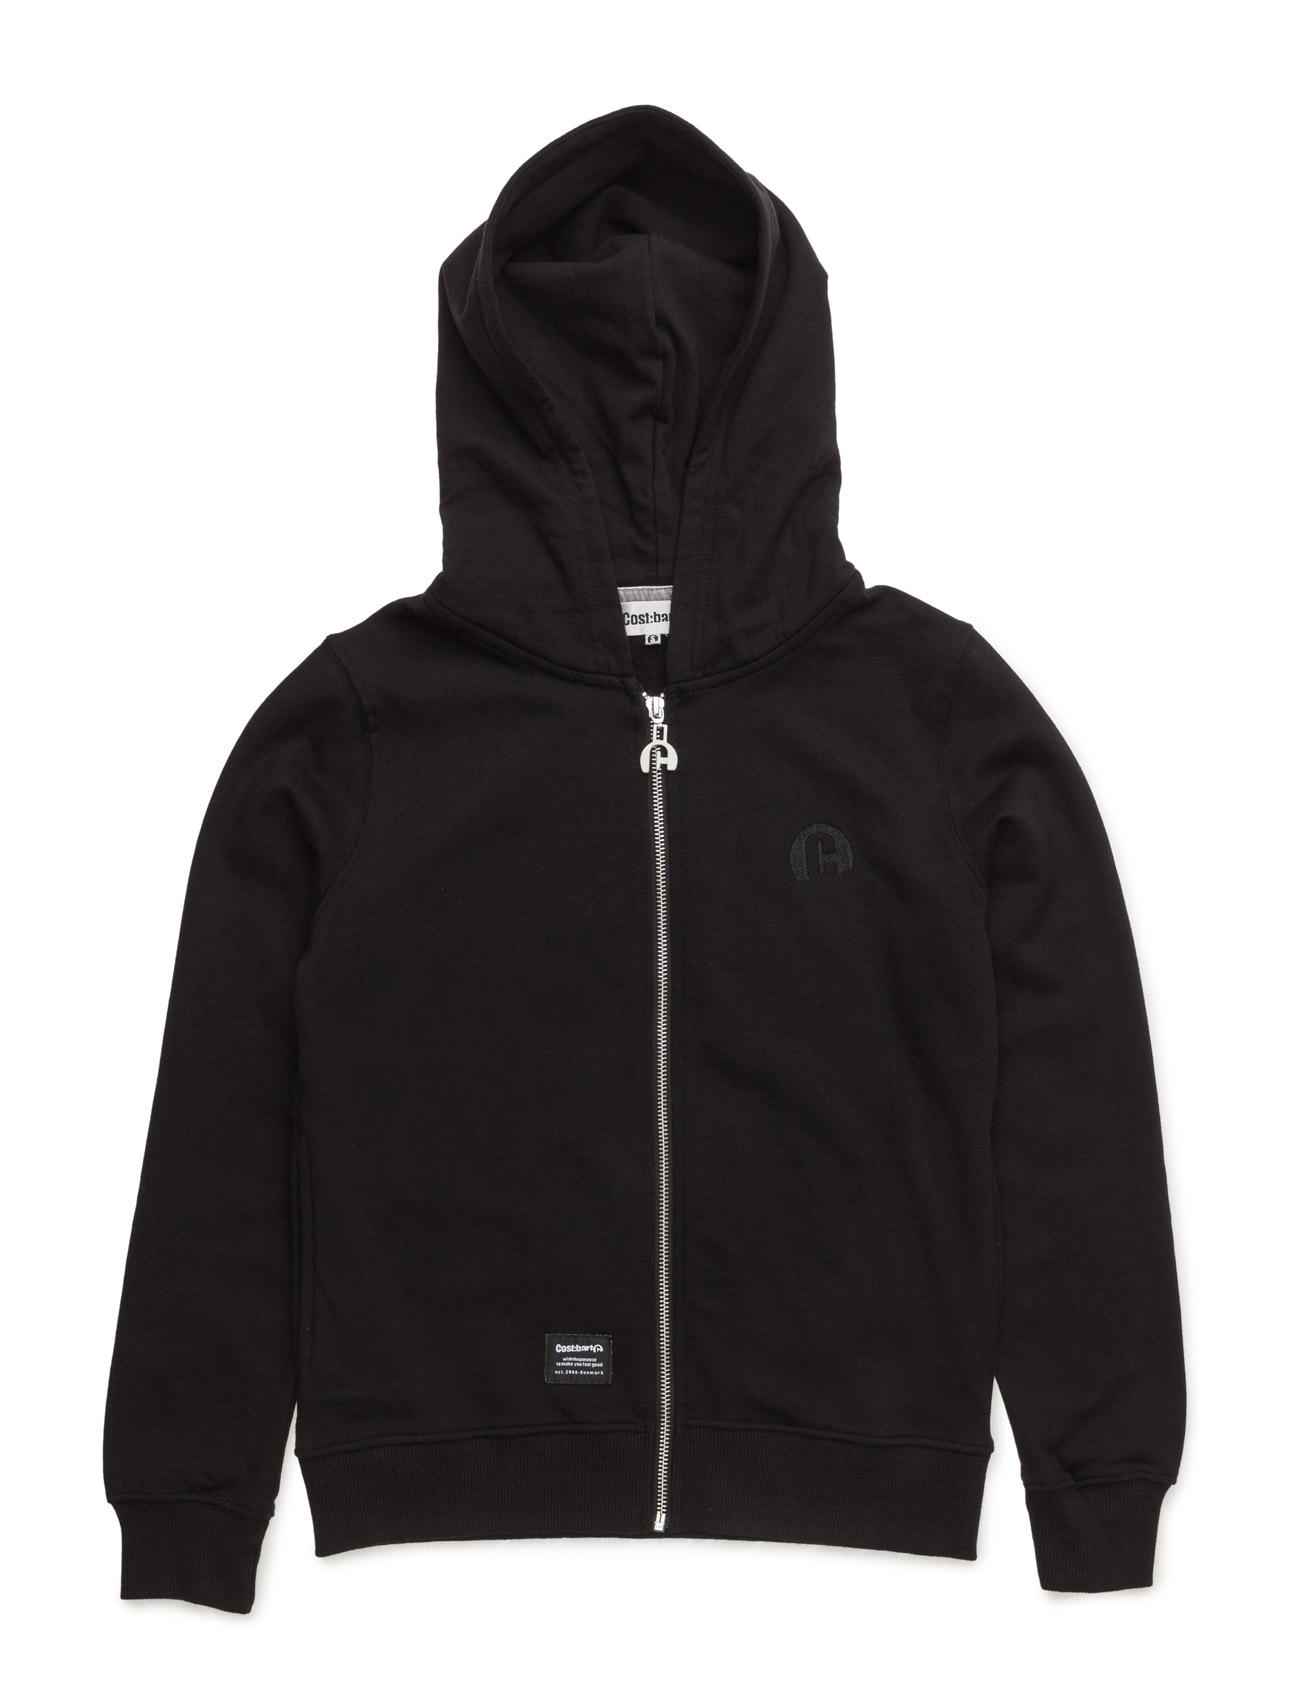 Lennon Sweatshirt CostBart Striktrøjer til Drenge i